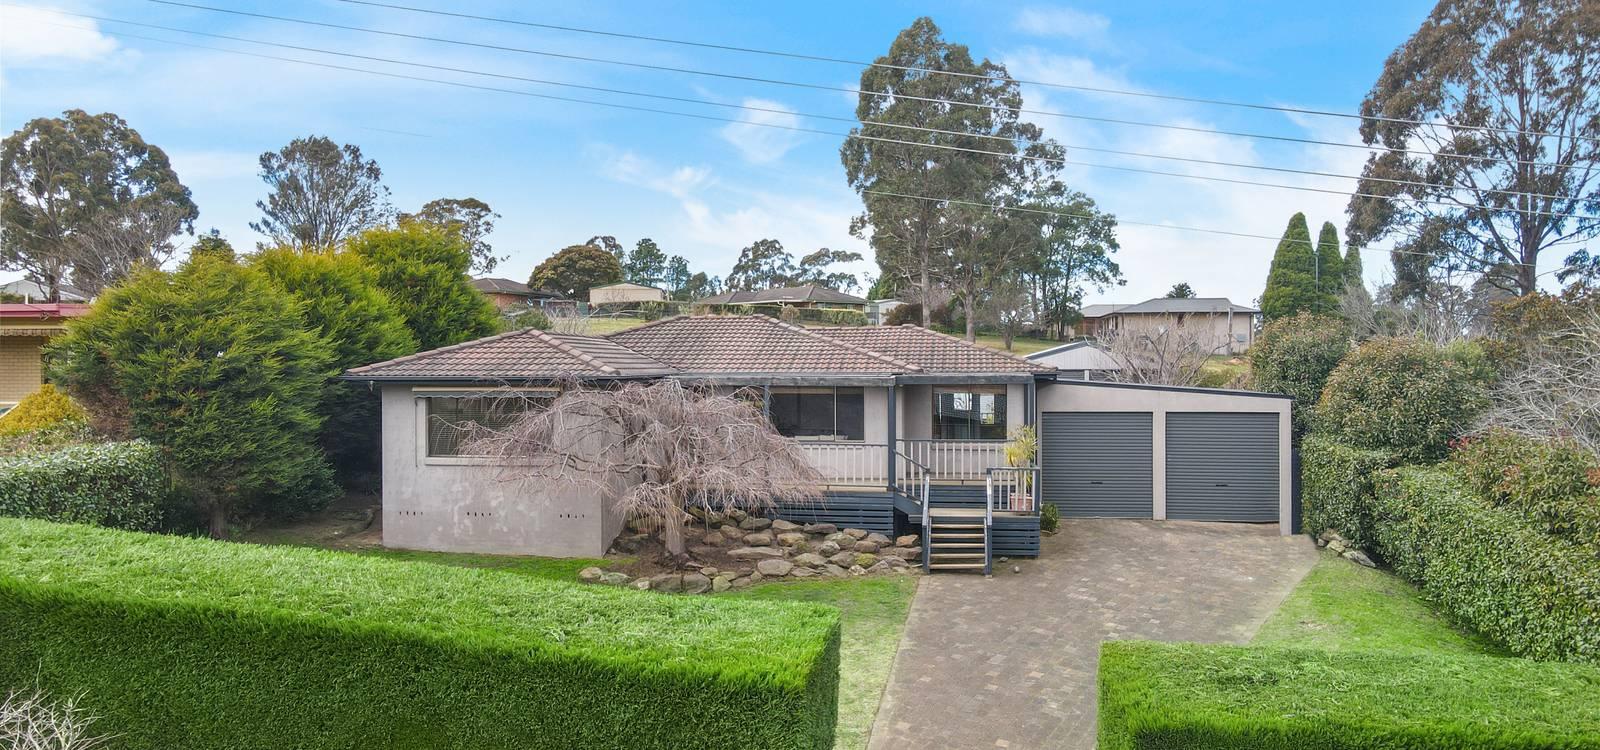 3 Wandevan Place MITTAGONG, NSW 2575 - photo 1